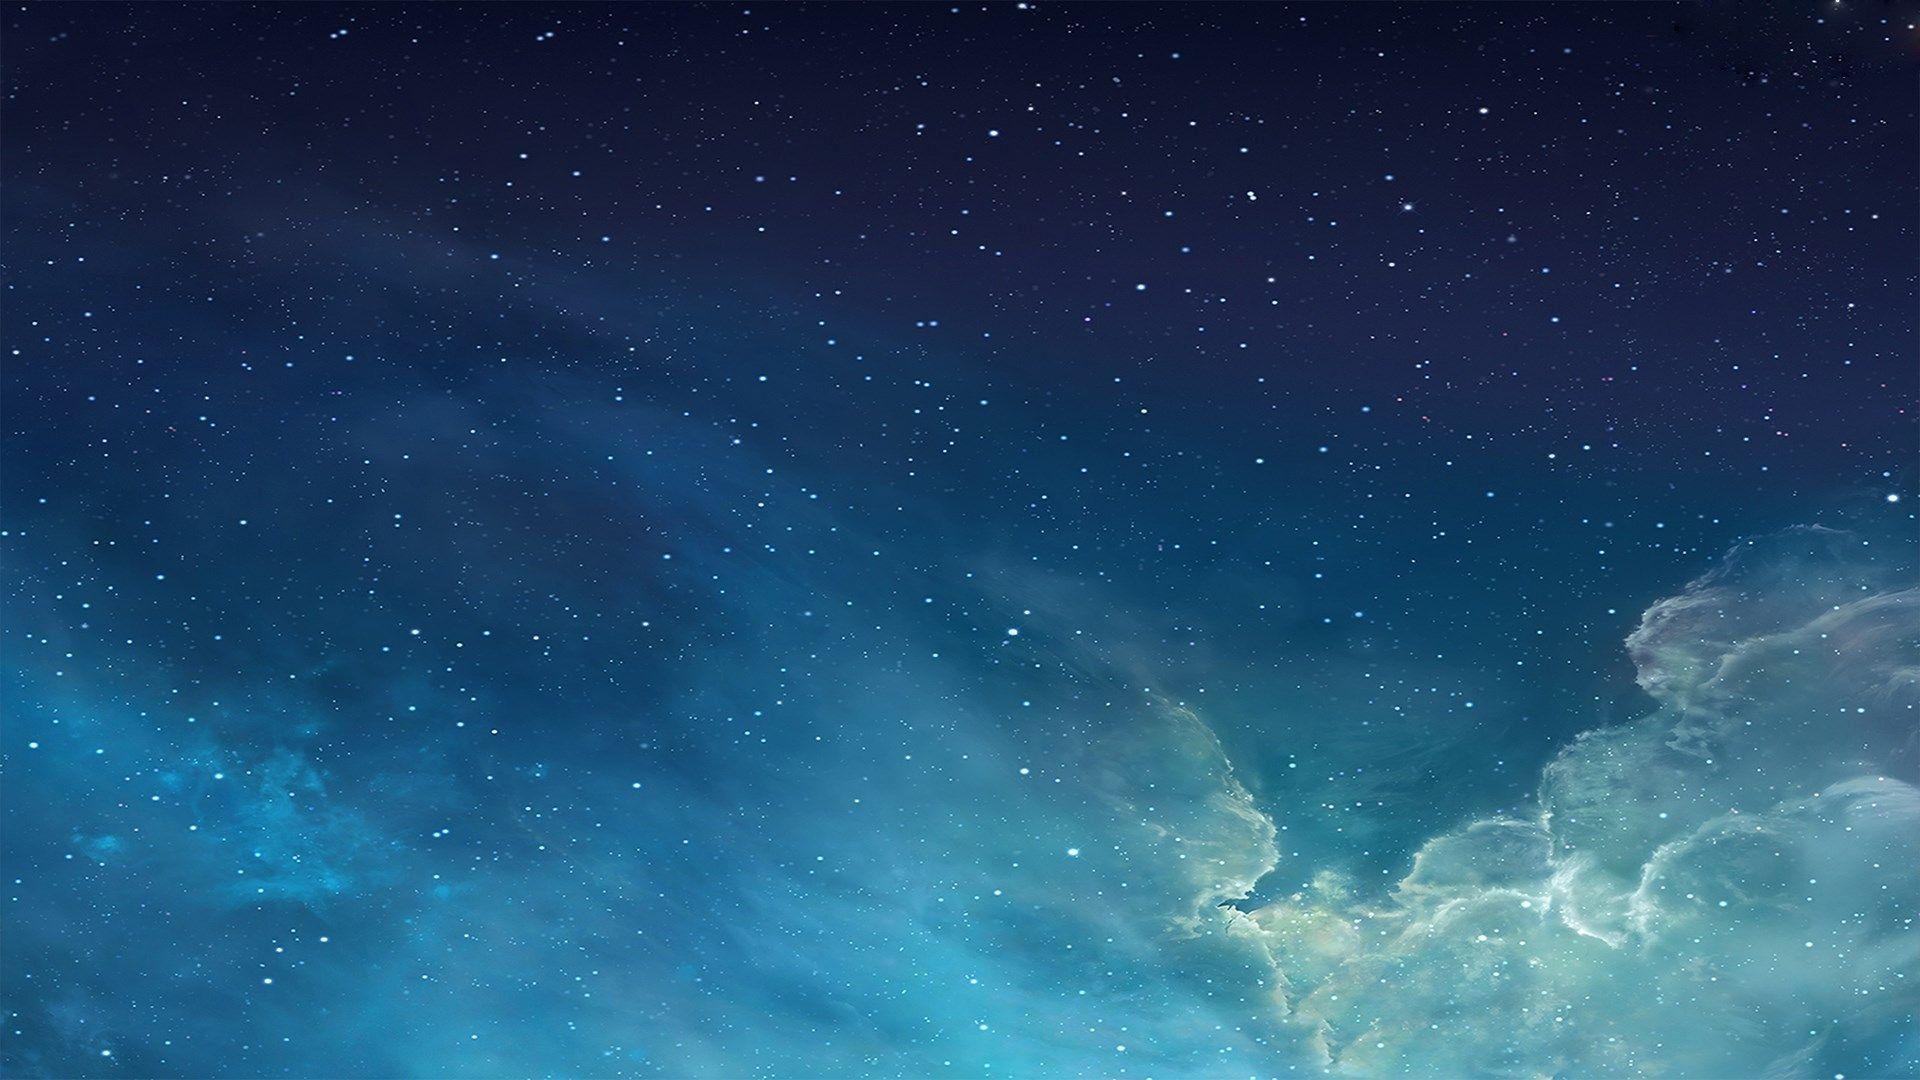 starry night sky cloud digital art 1920x1080 wallpapers